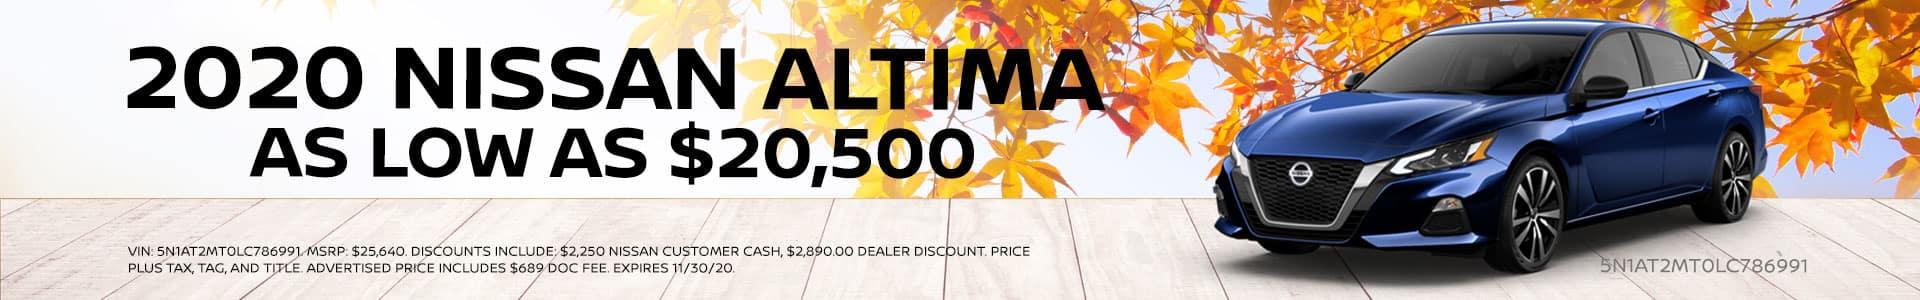 2020 Nissan Altima starting at $20,500